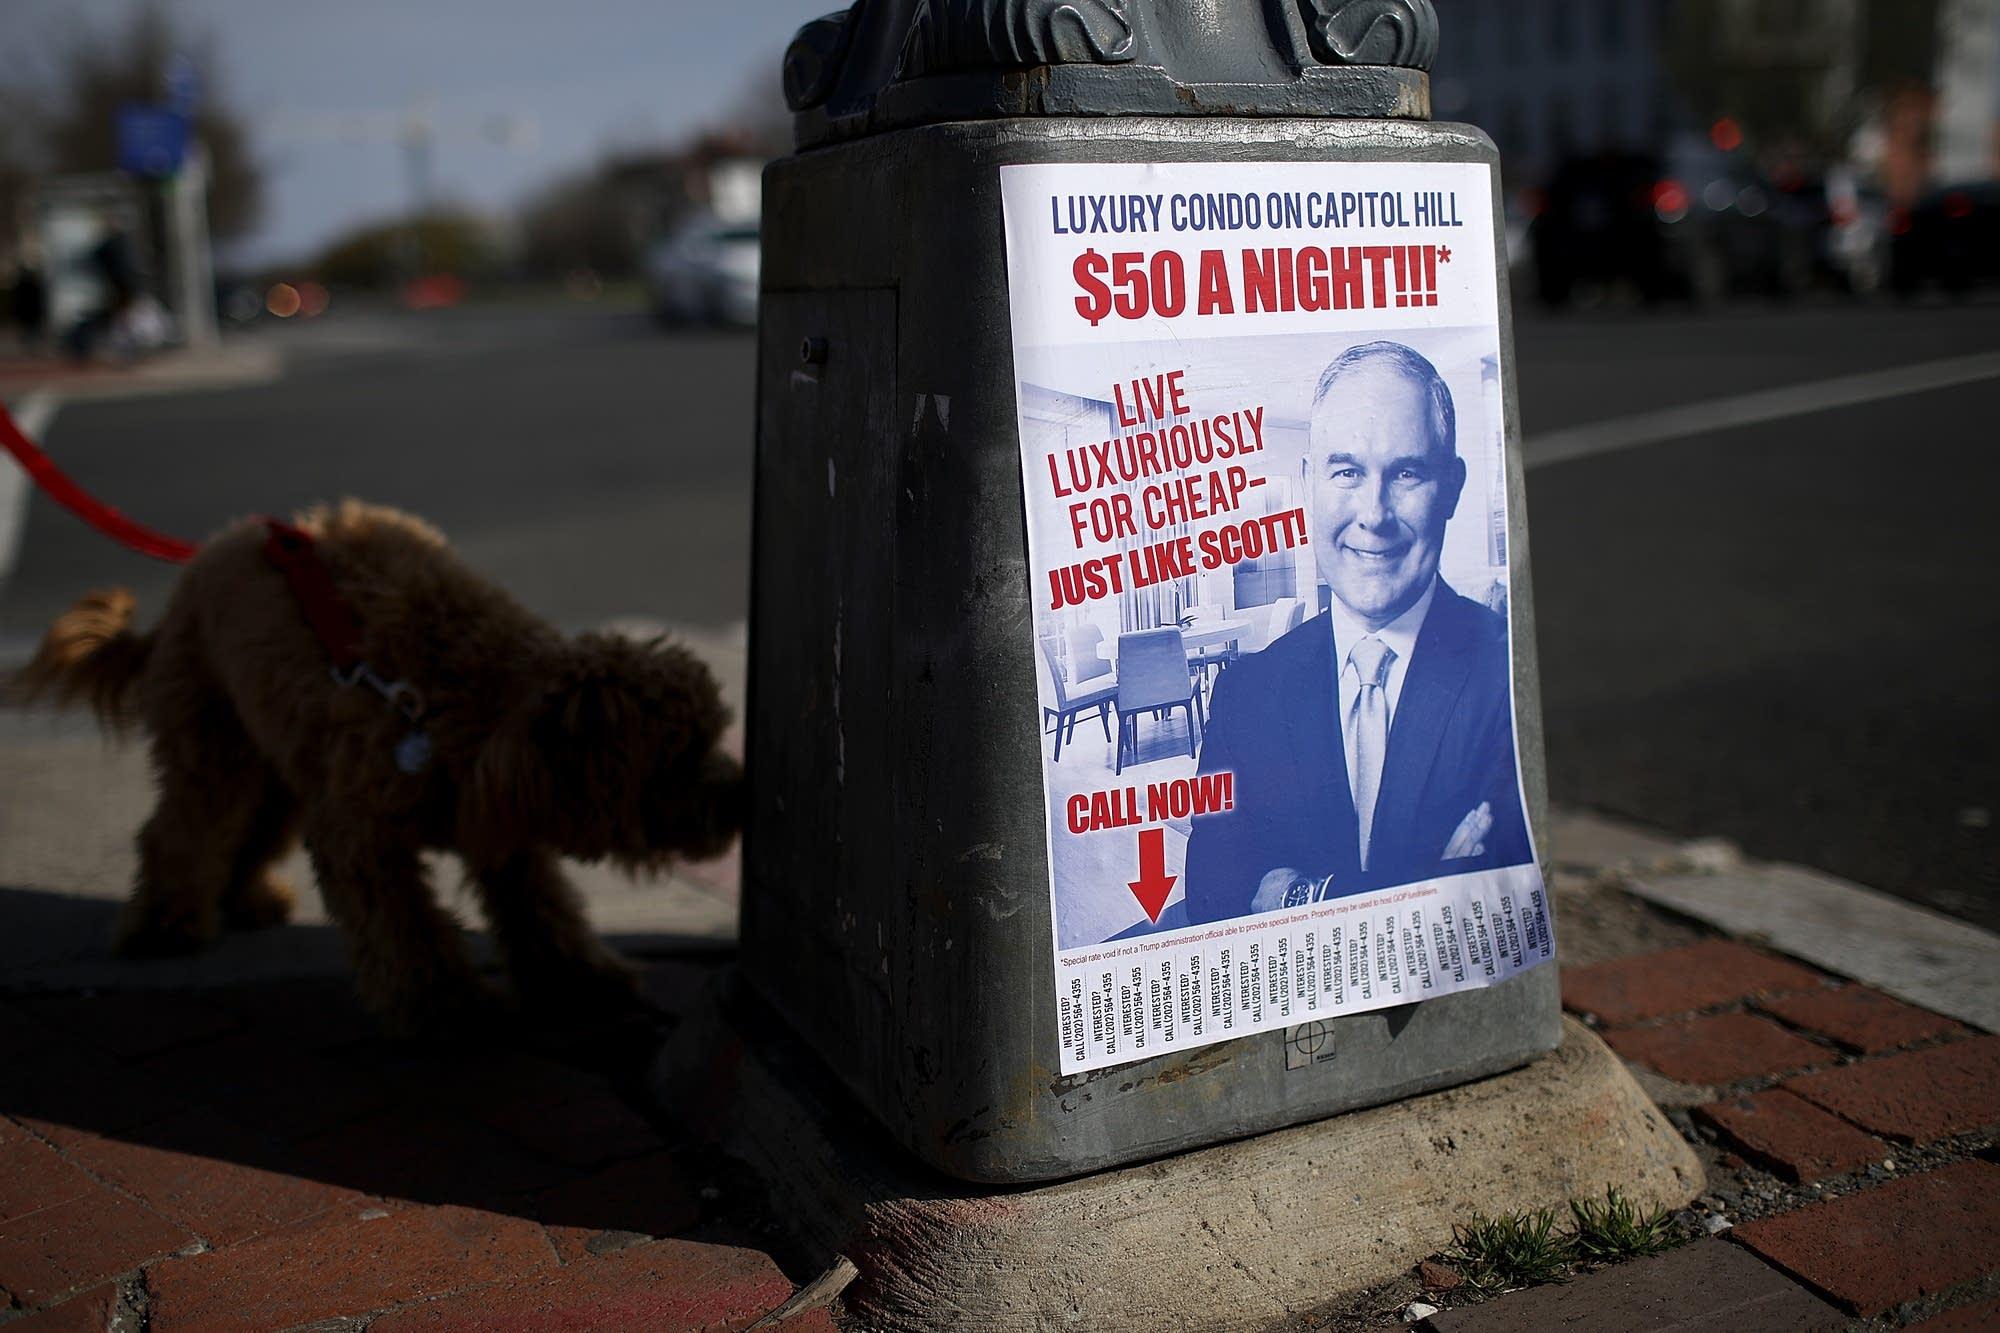 AP reports EPA's Pruitt spent millions on security, travel ...